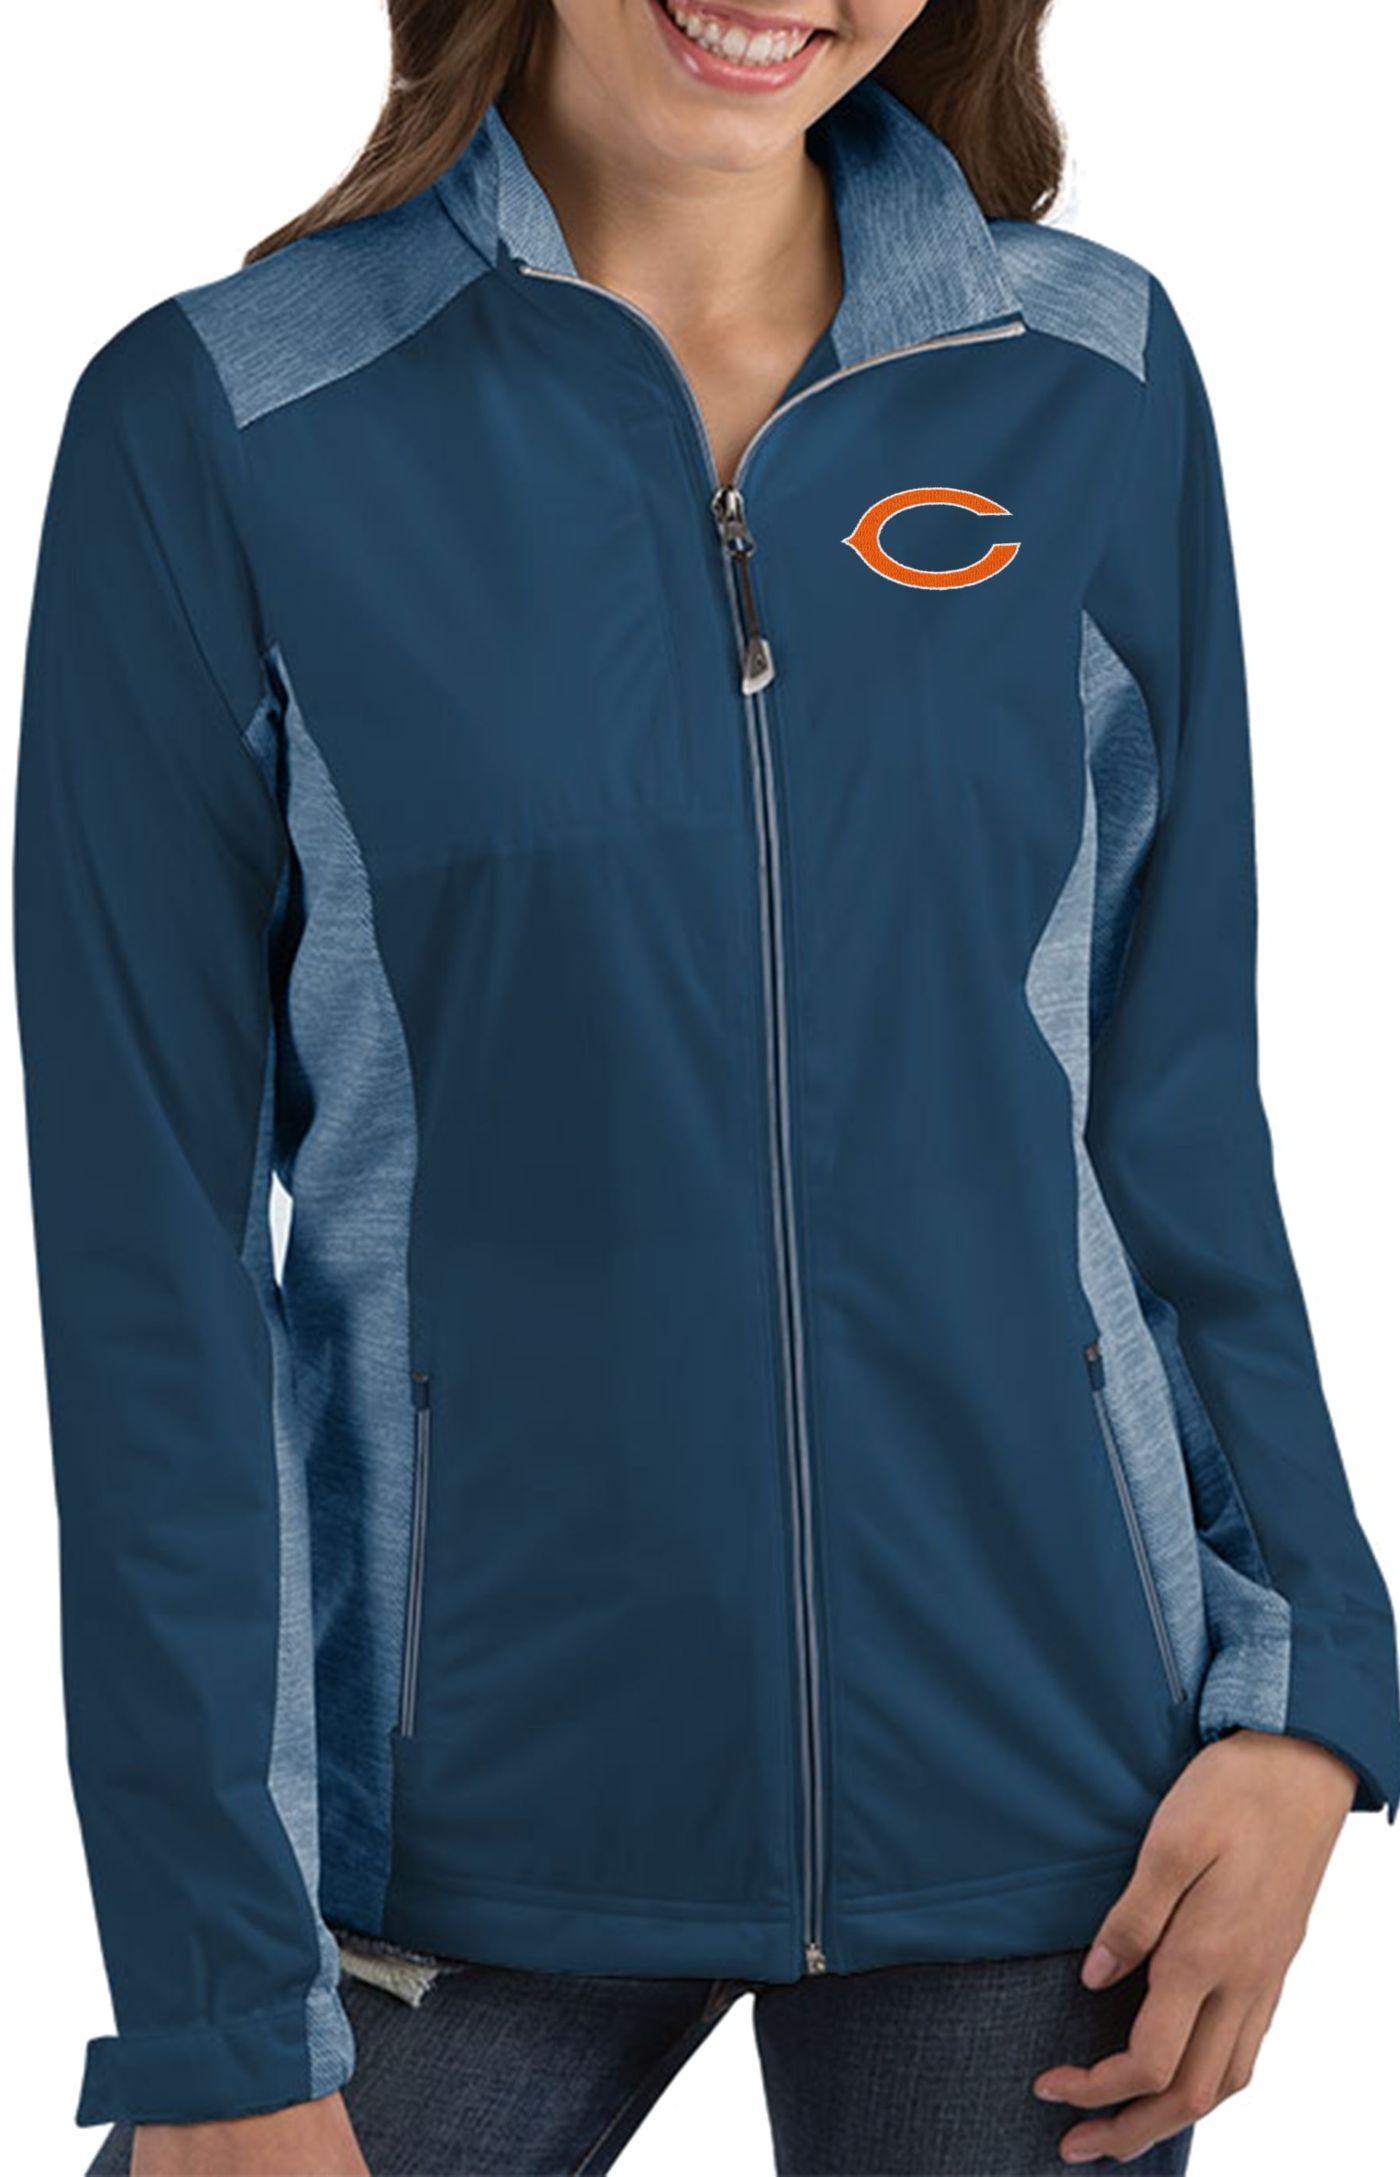 Antigua Women's Chicago Bears Revolve Navy Full-Zip Jacket